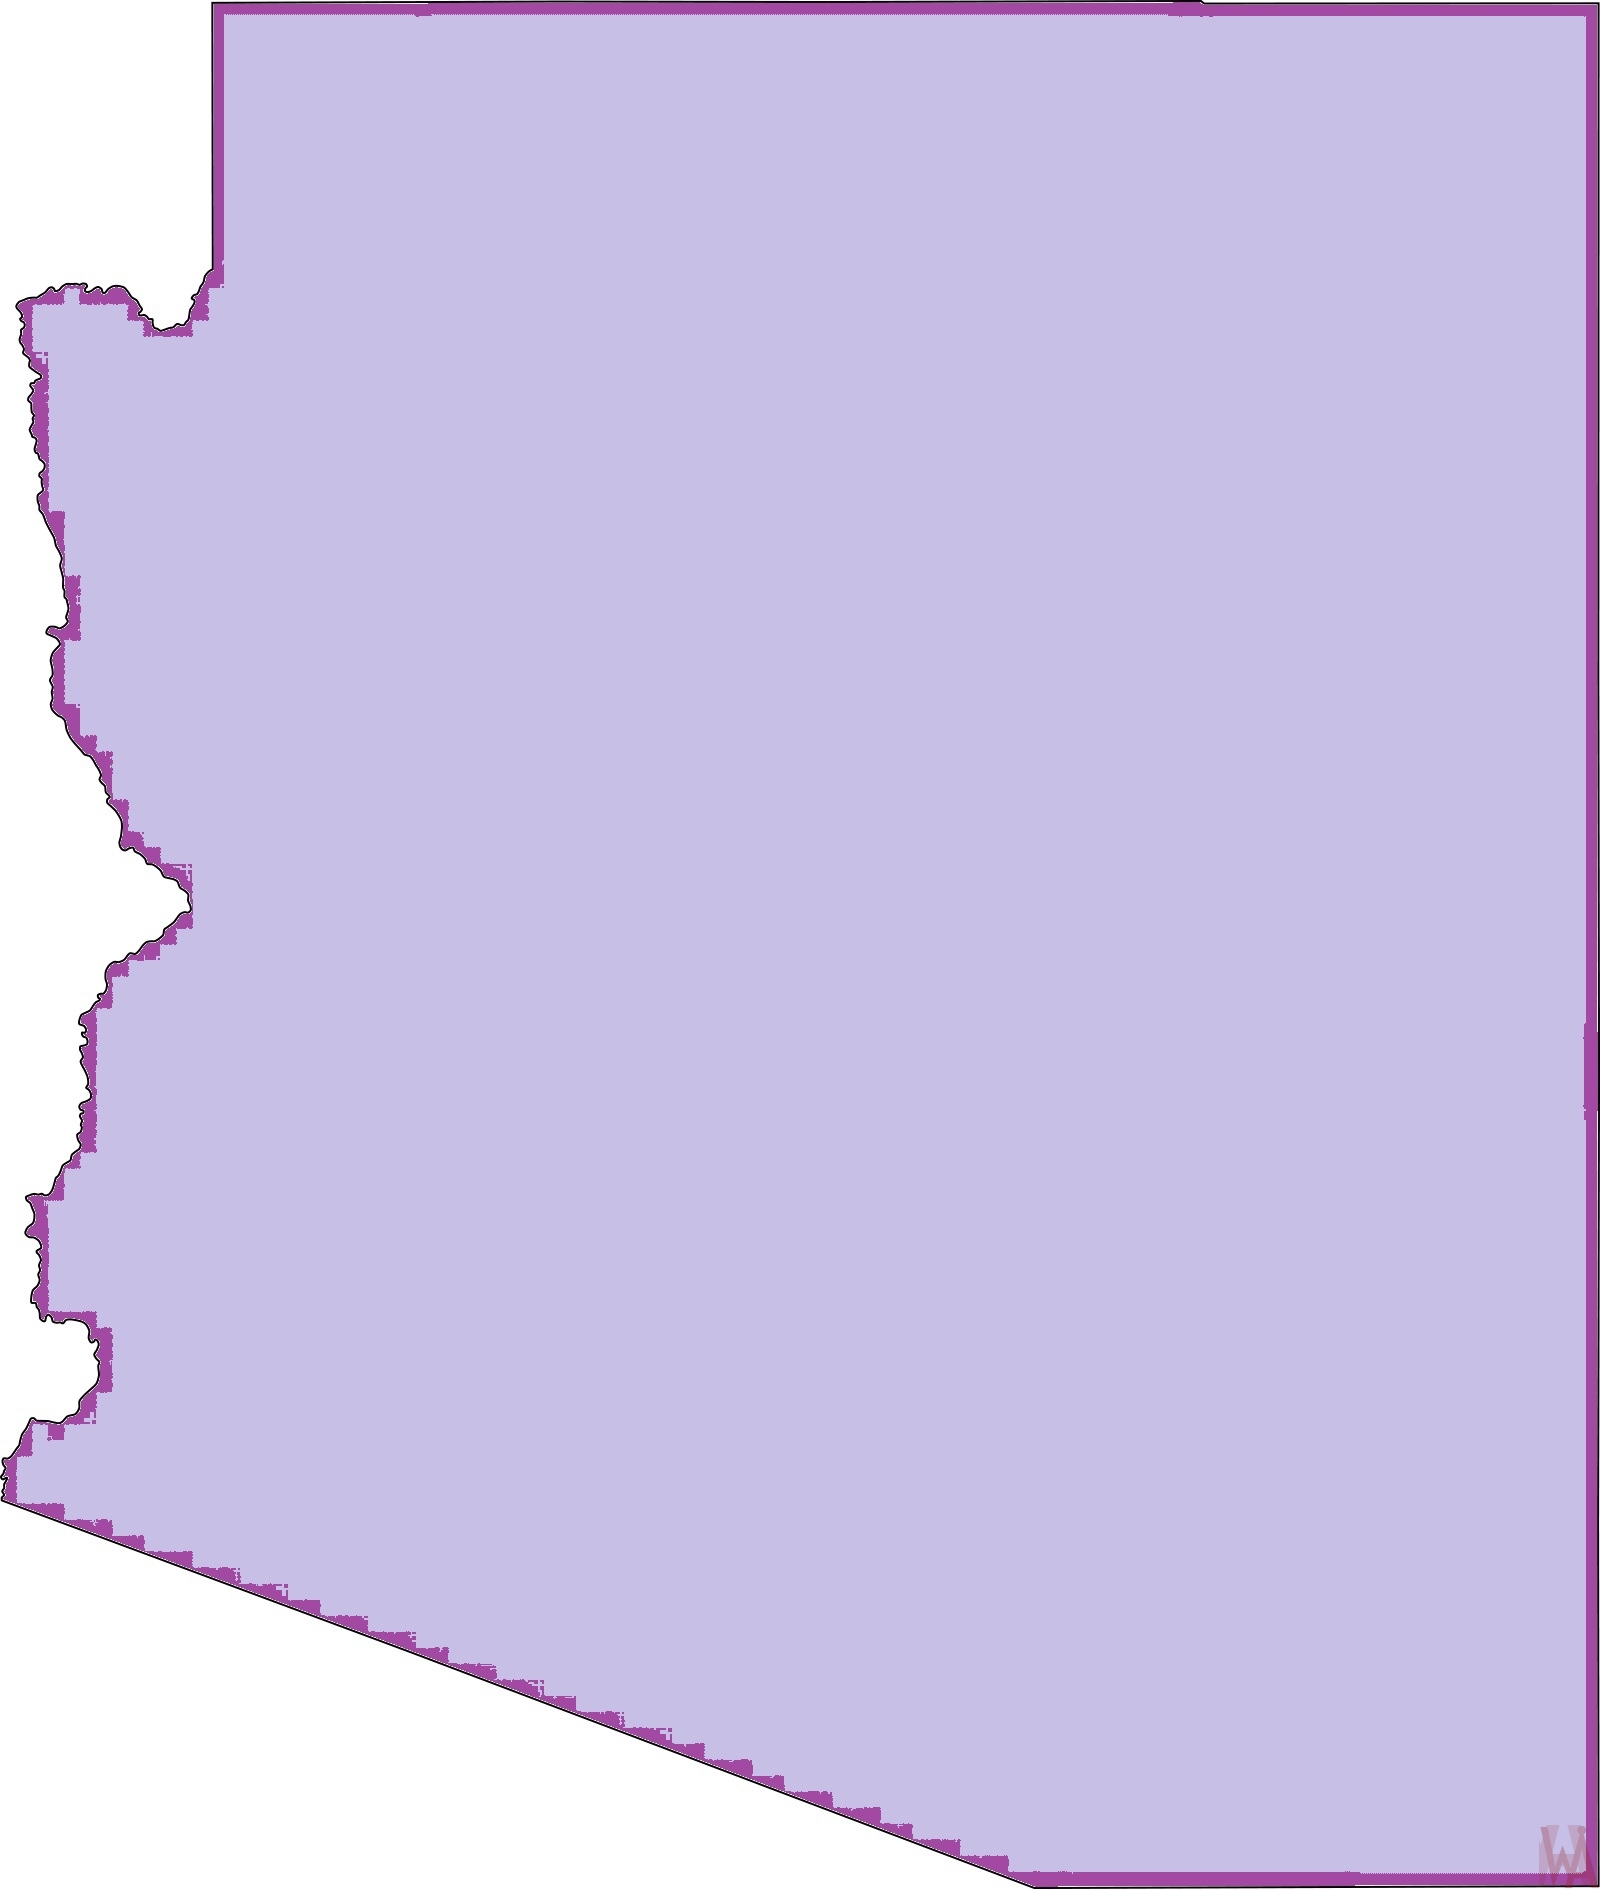 Arizona Blank Outline Map |  Blank Outline Map of Arizona – 4